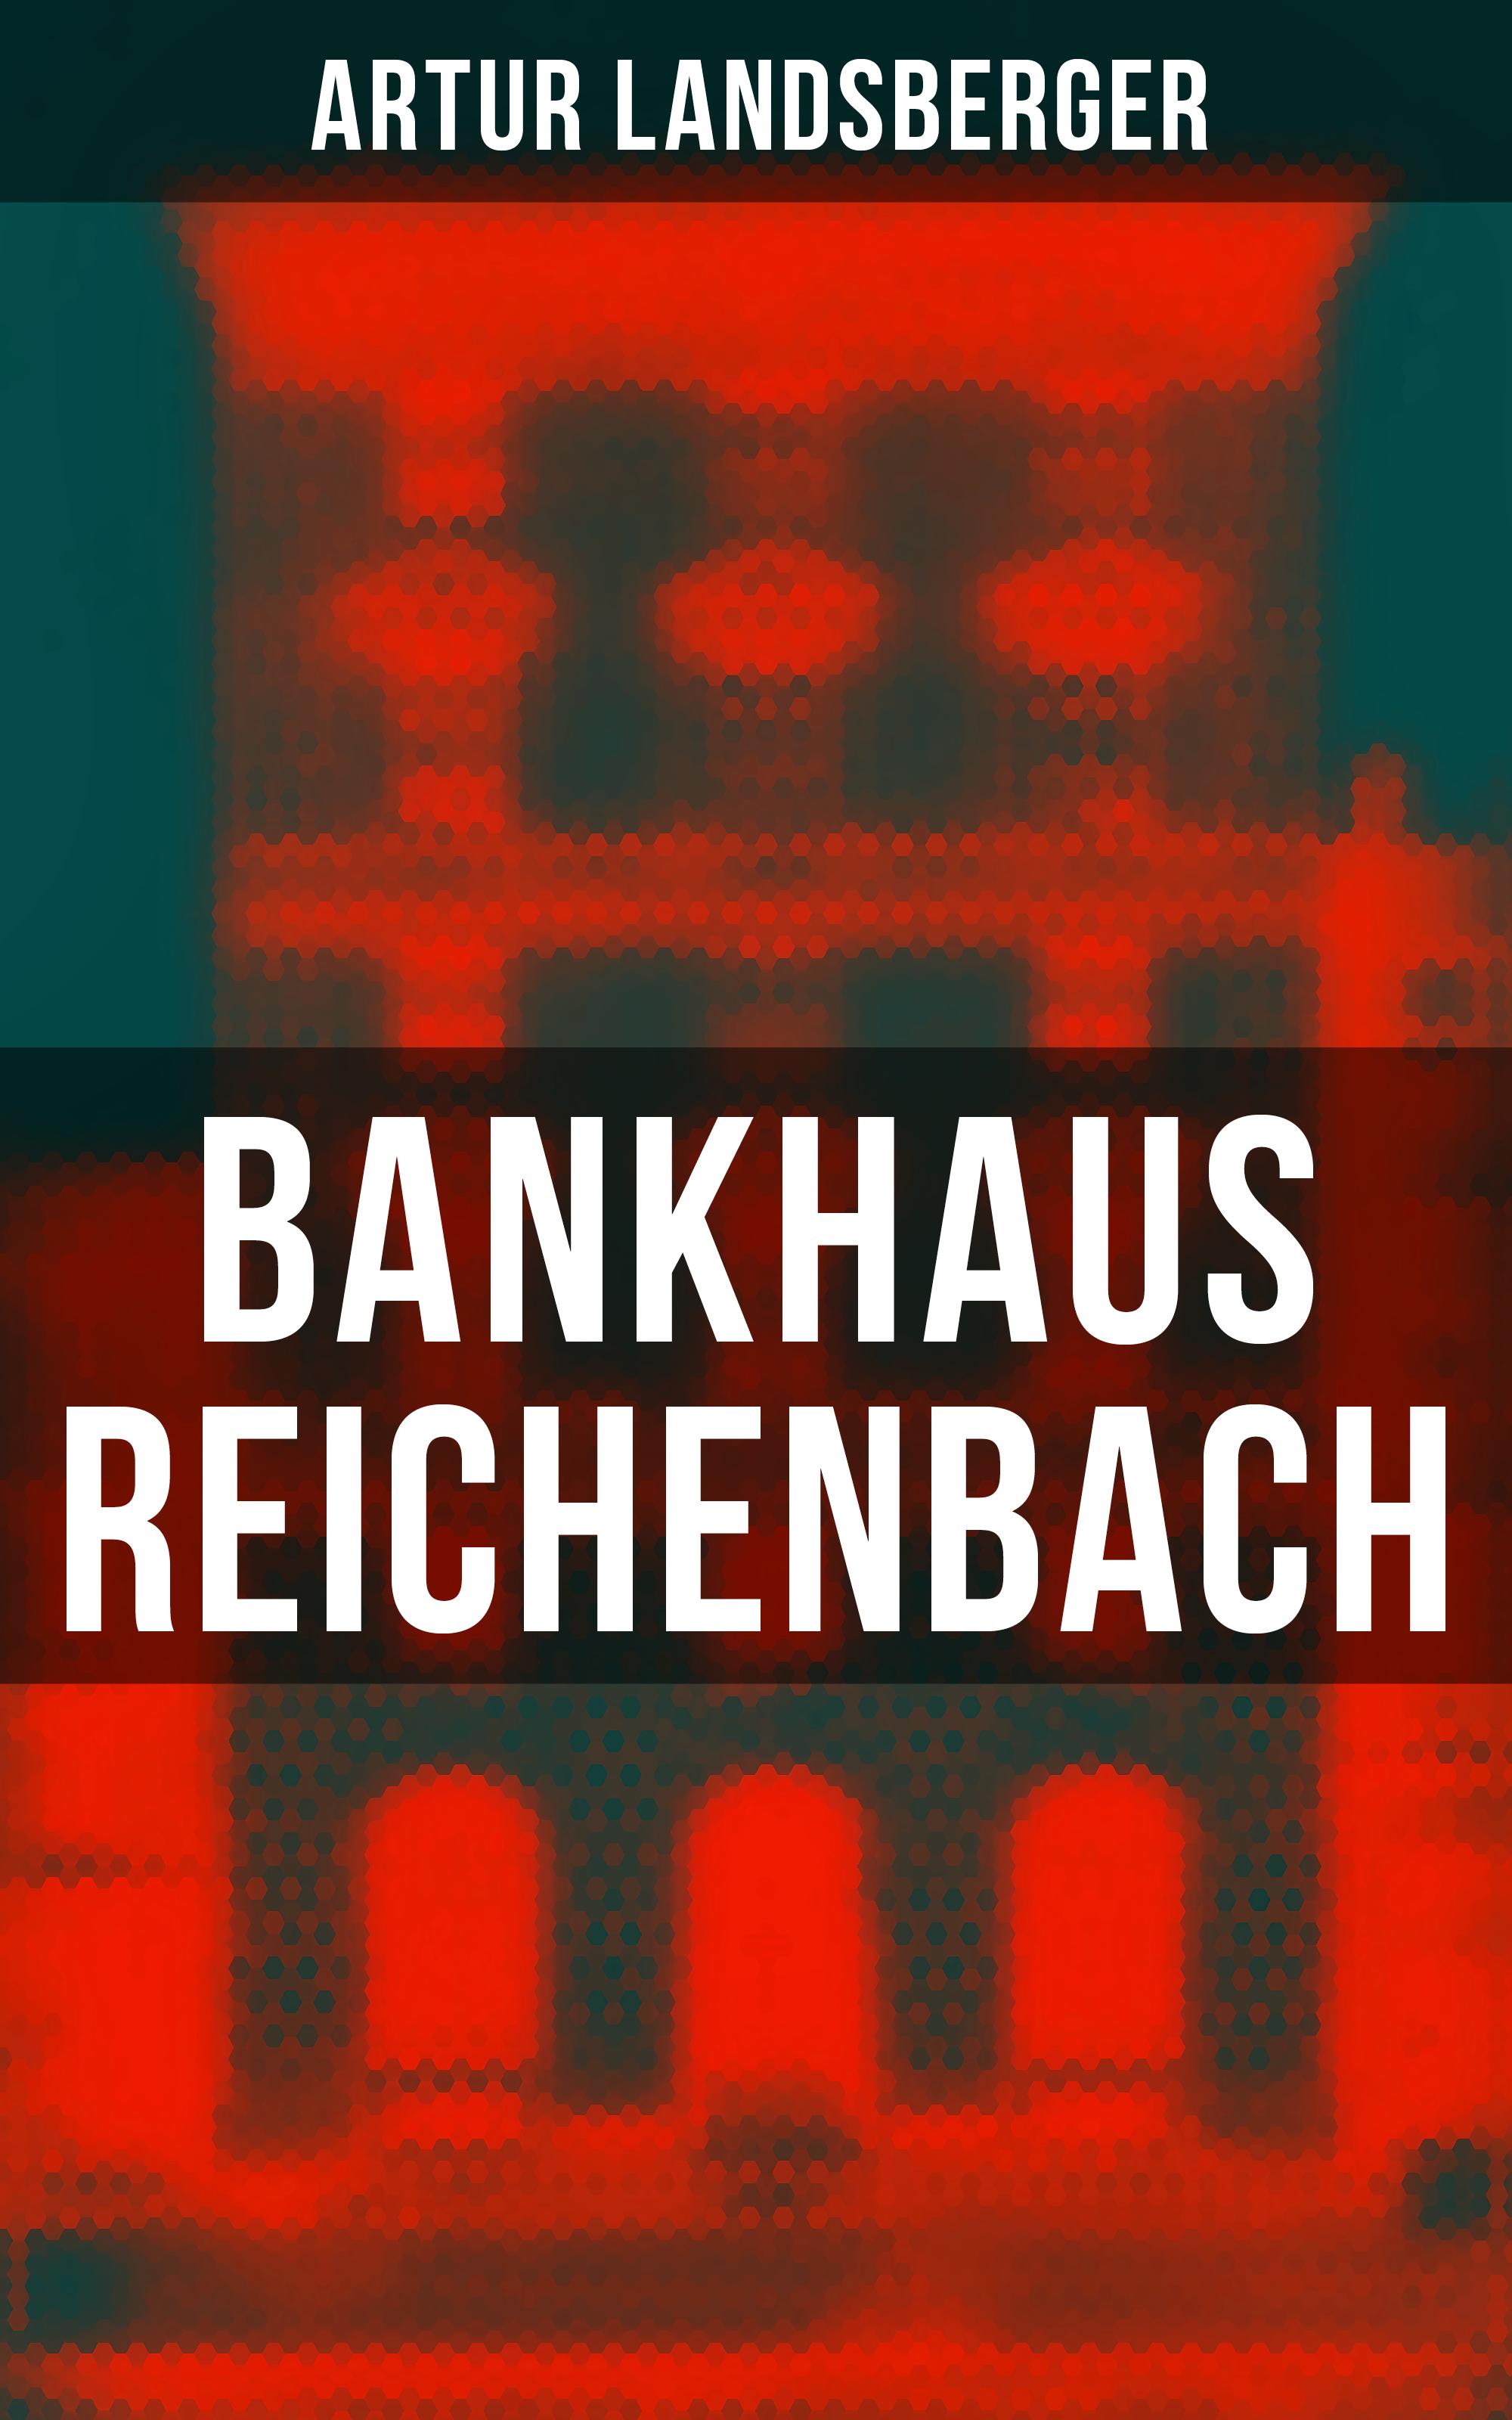 цены Artur Landsberger Bankhaus Reichenbach